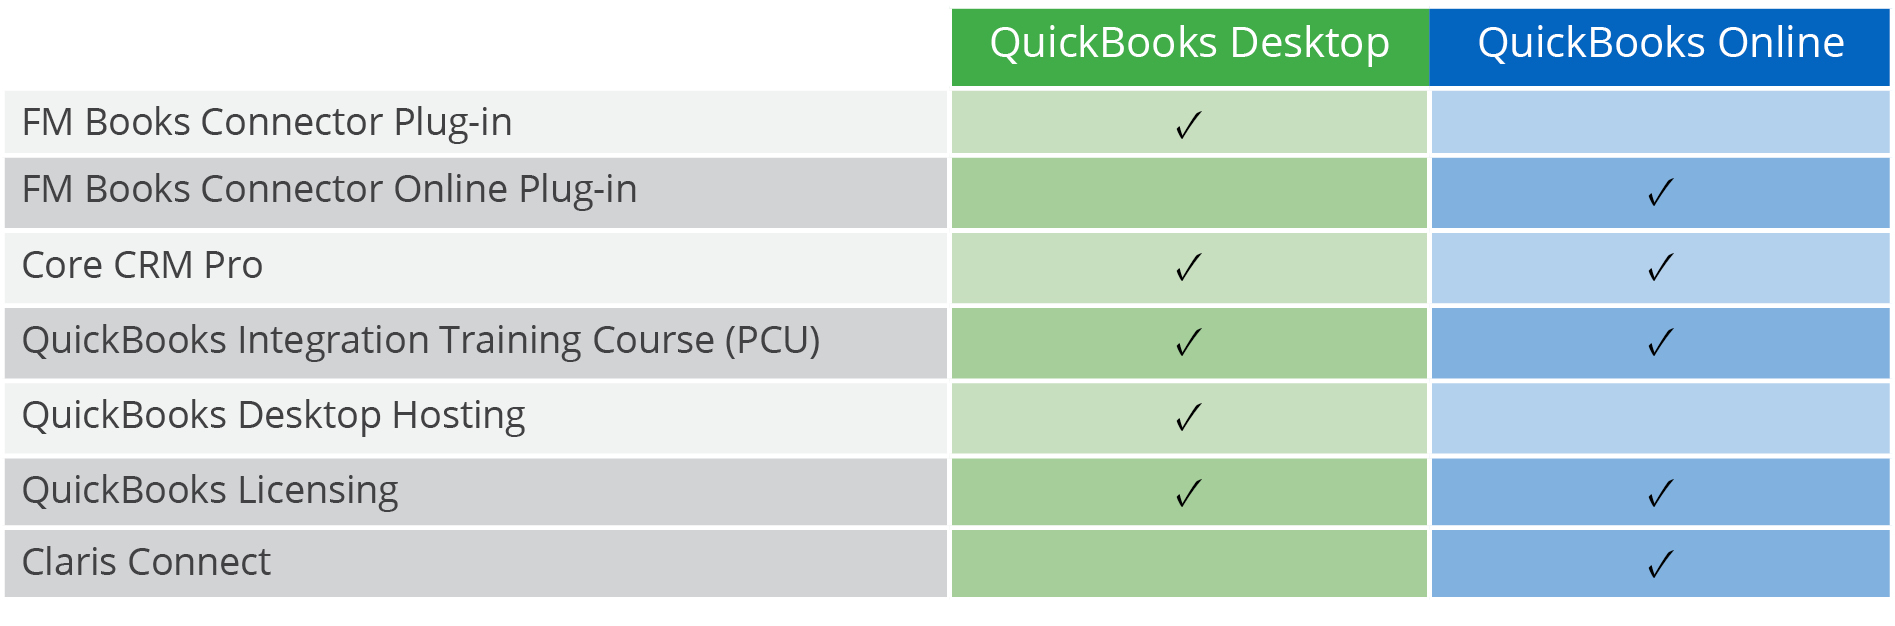 QuickBooks Online Vs. Desktop Table